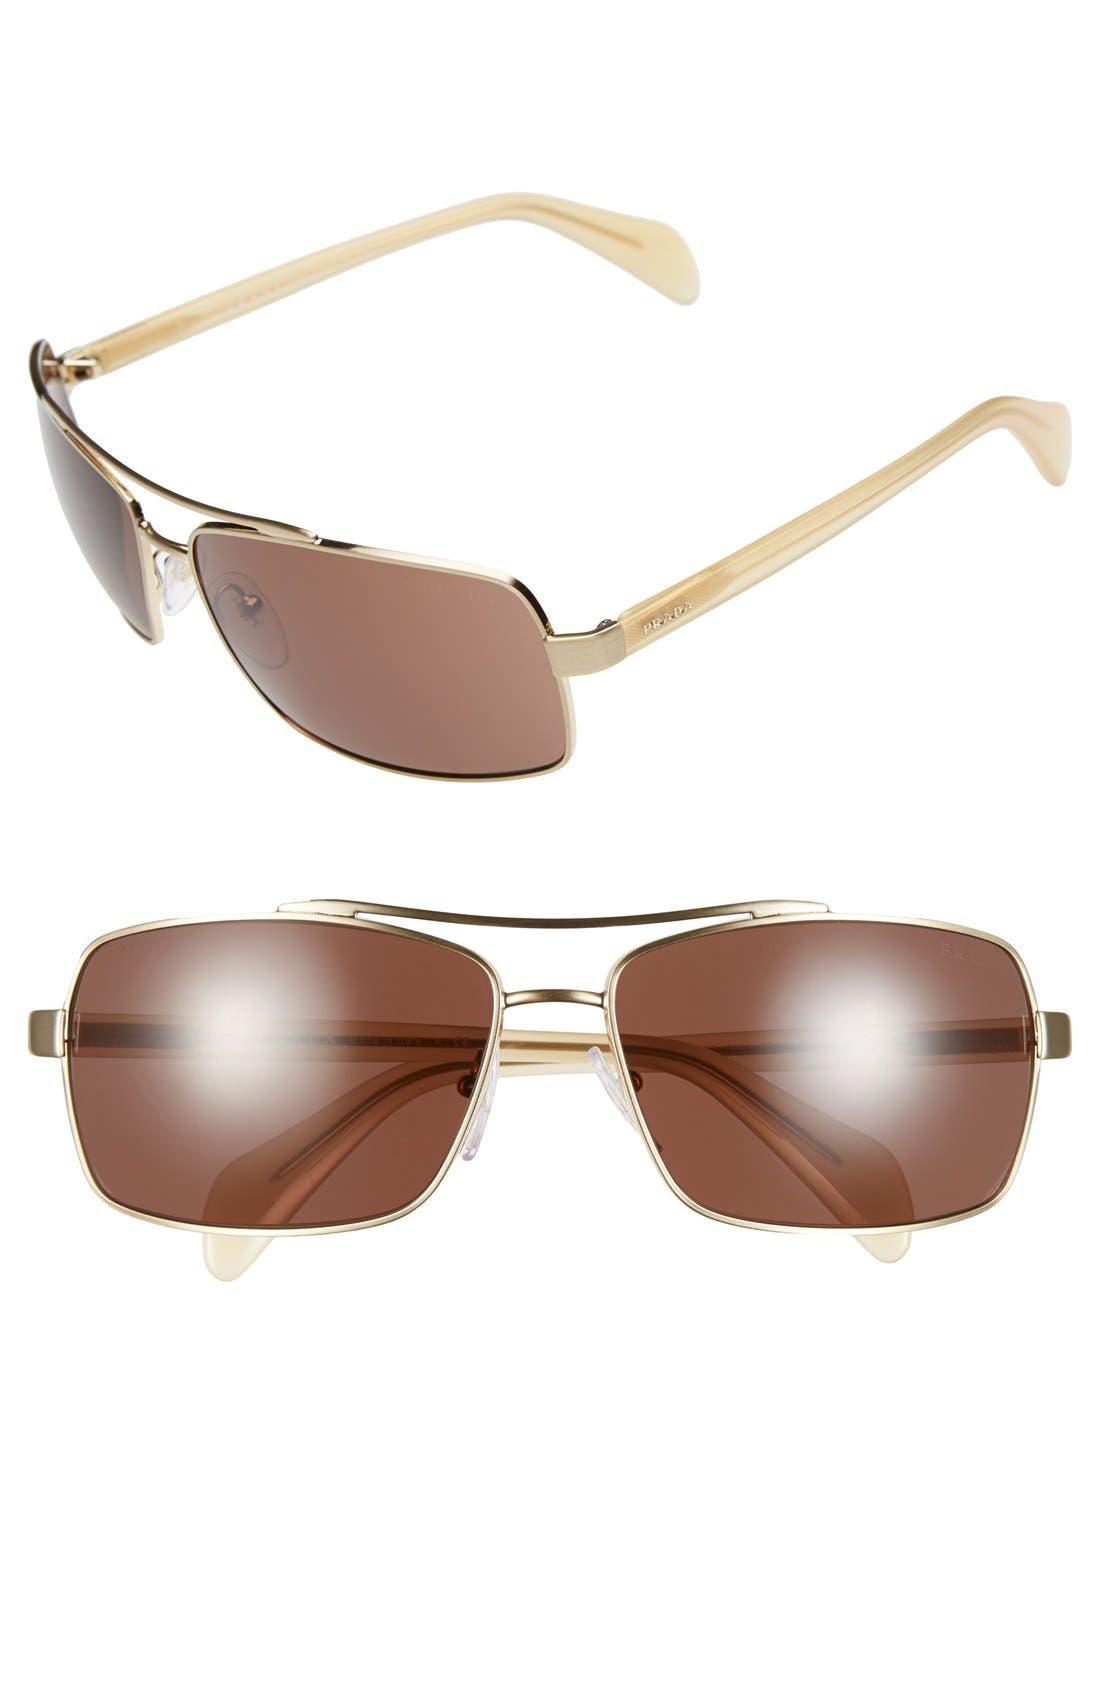 Alternate Image 1 Selected - Prada 'Society' 63mm Sunglasses